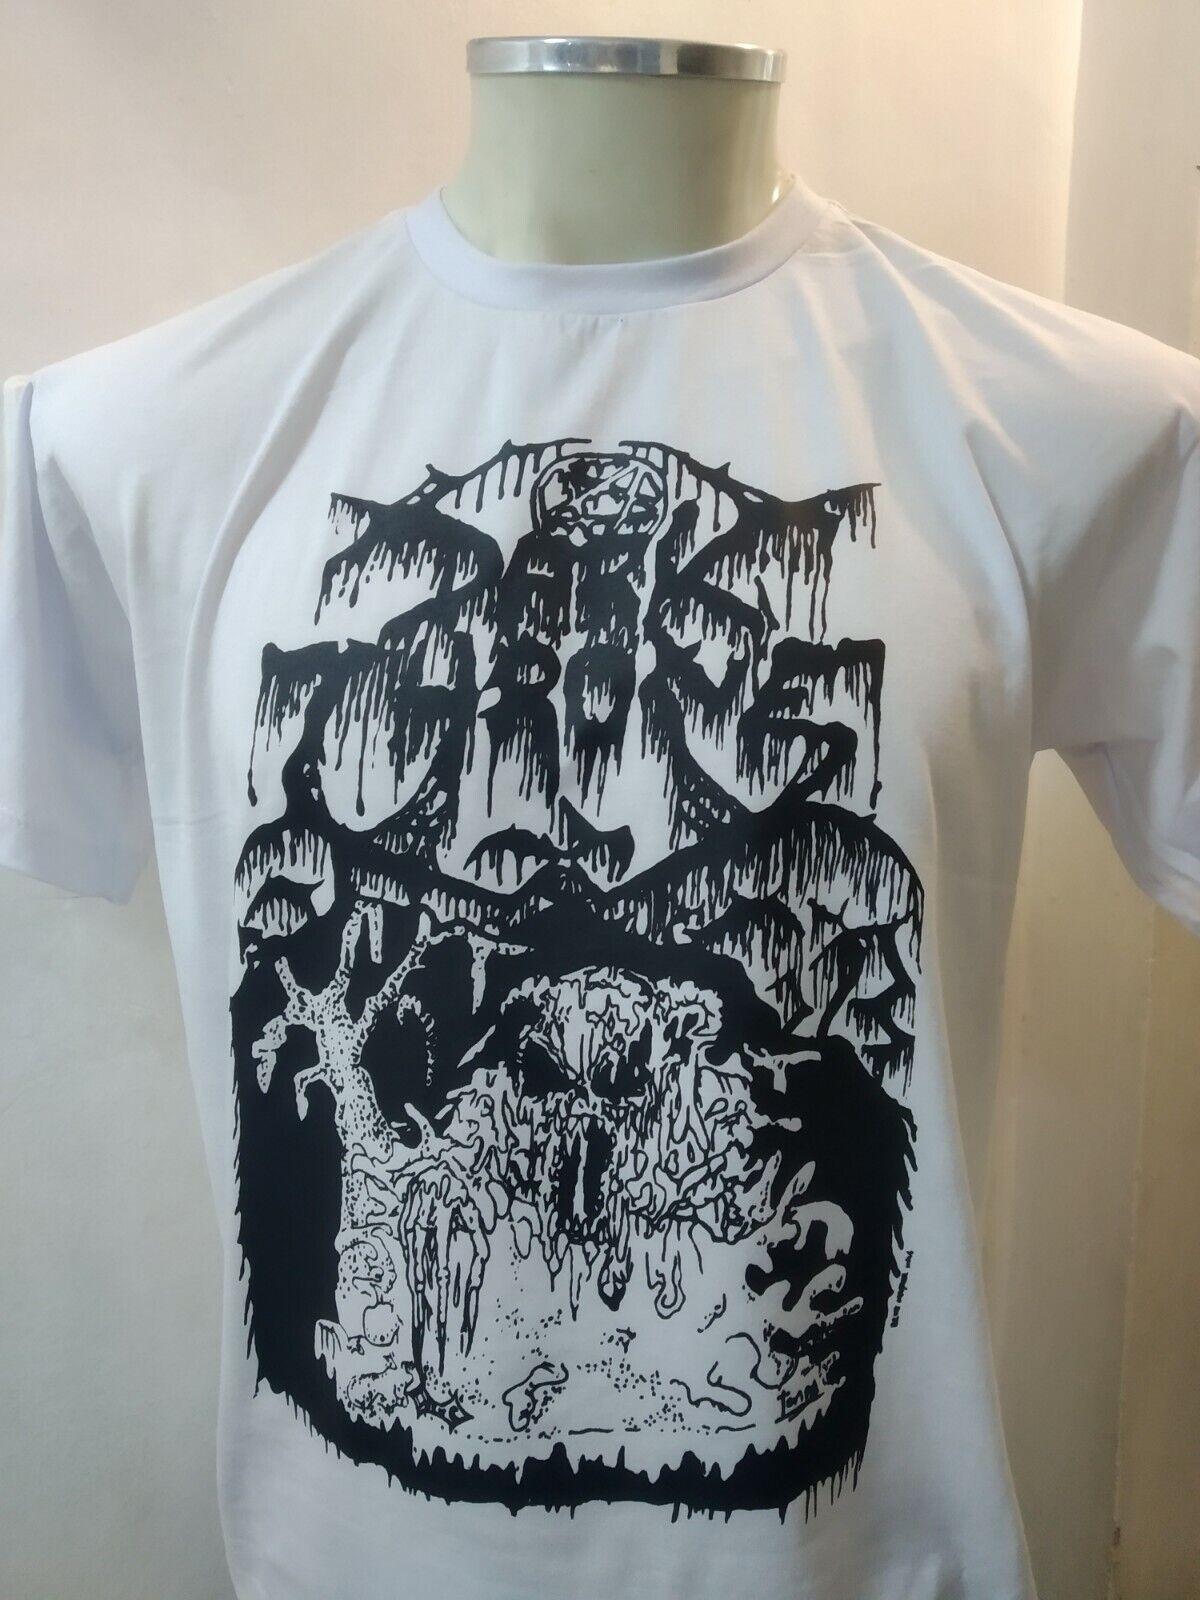 1BURZUM Filosofem Metal Band Mayhem Emperor Bathory Best Shirt Gildan US Size